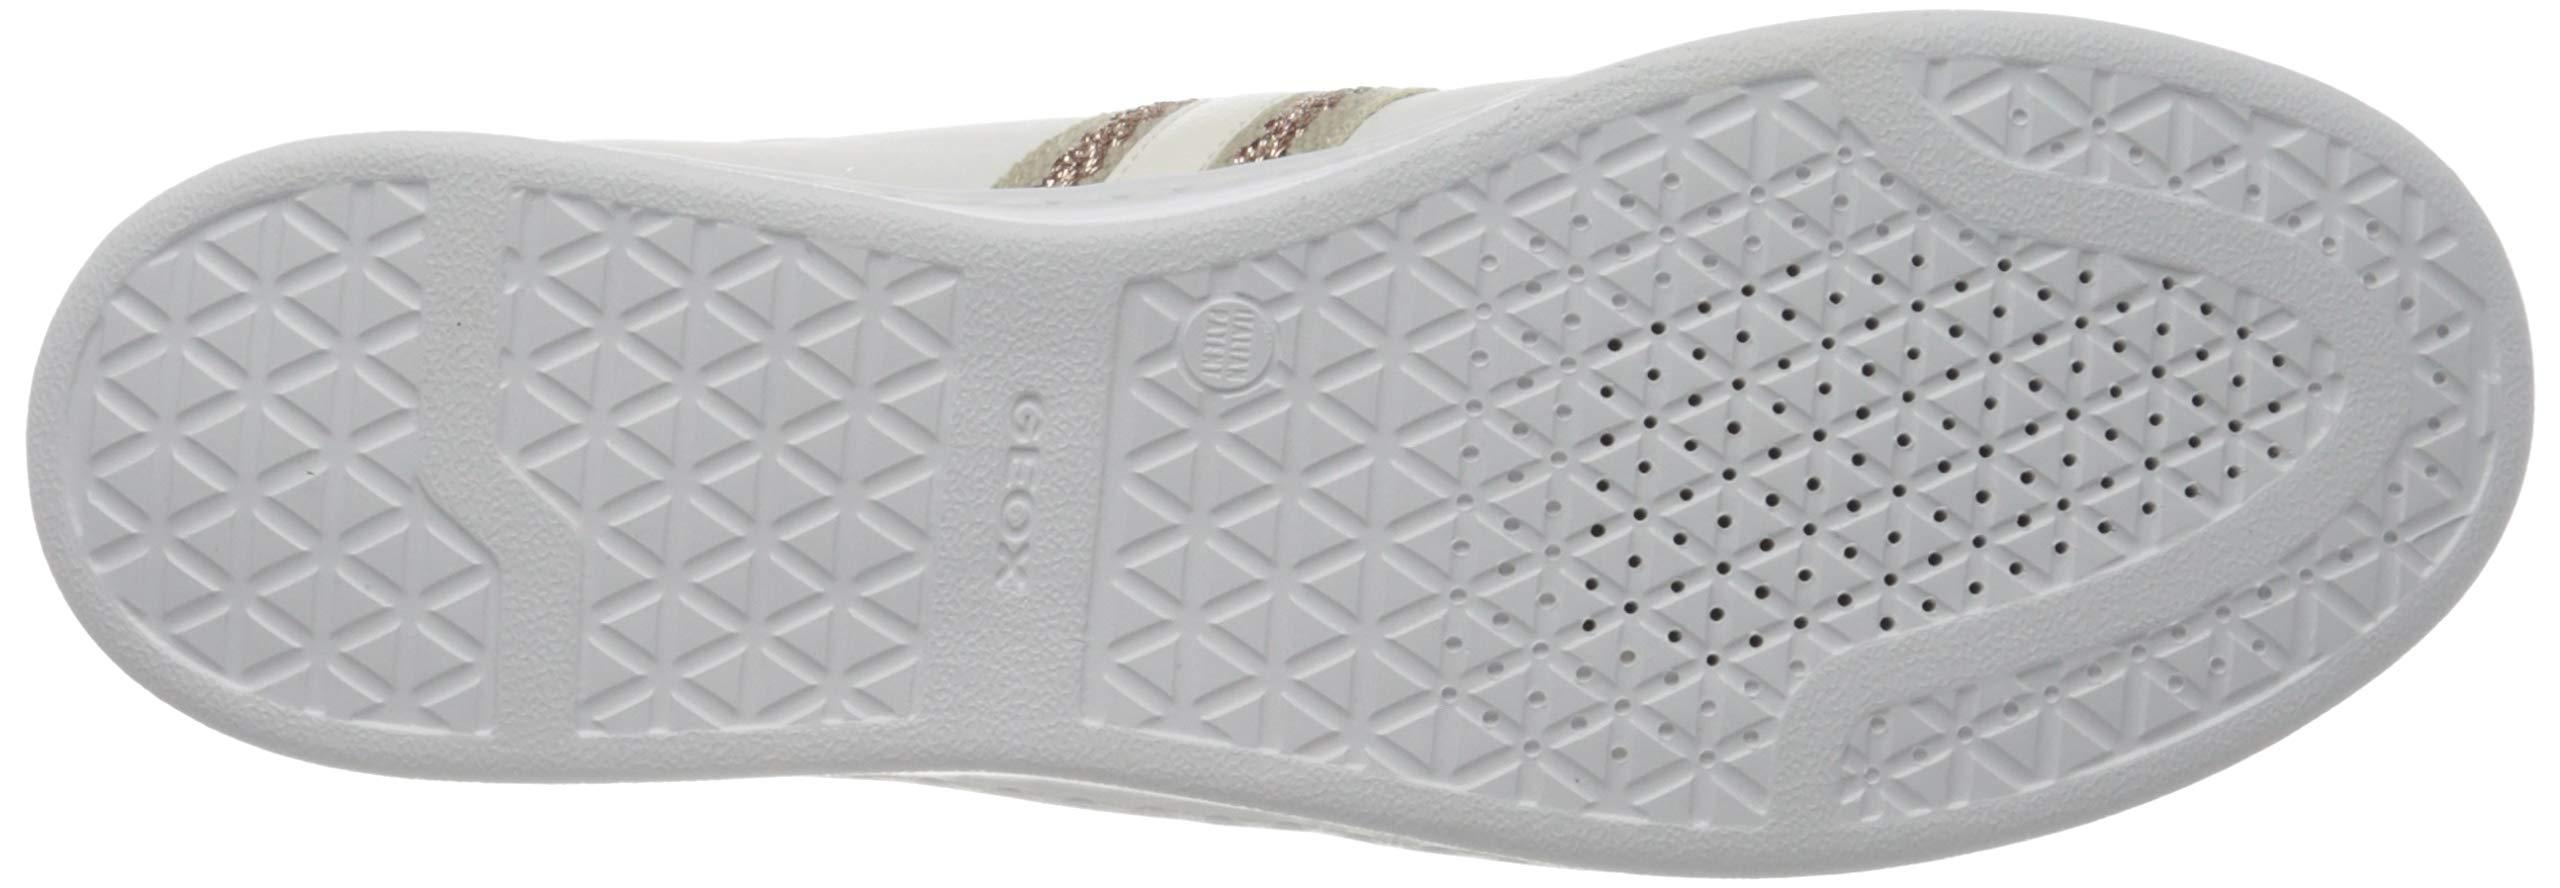 Geox Damen D Jaysen A Sneaker 3